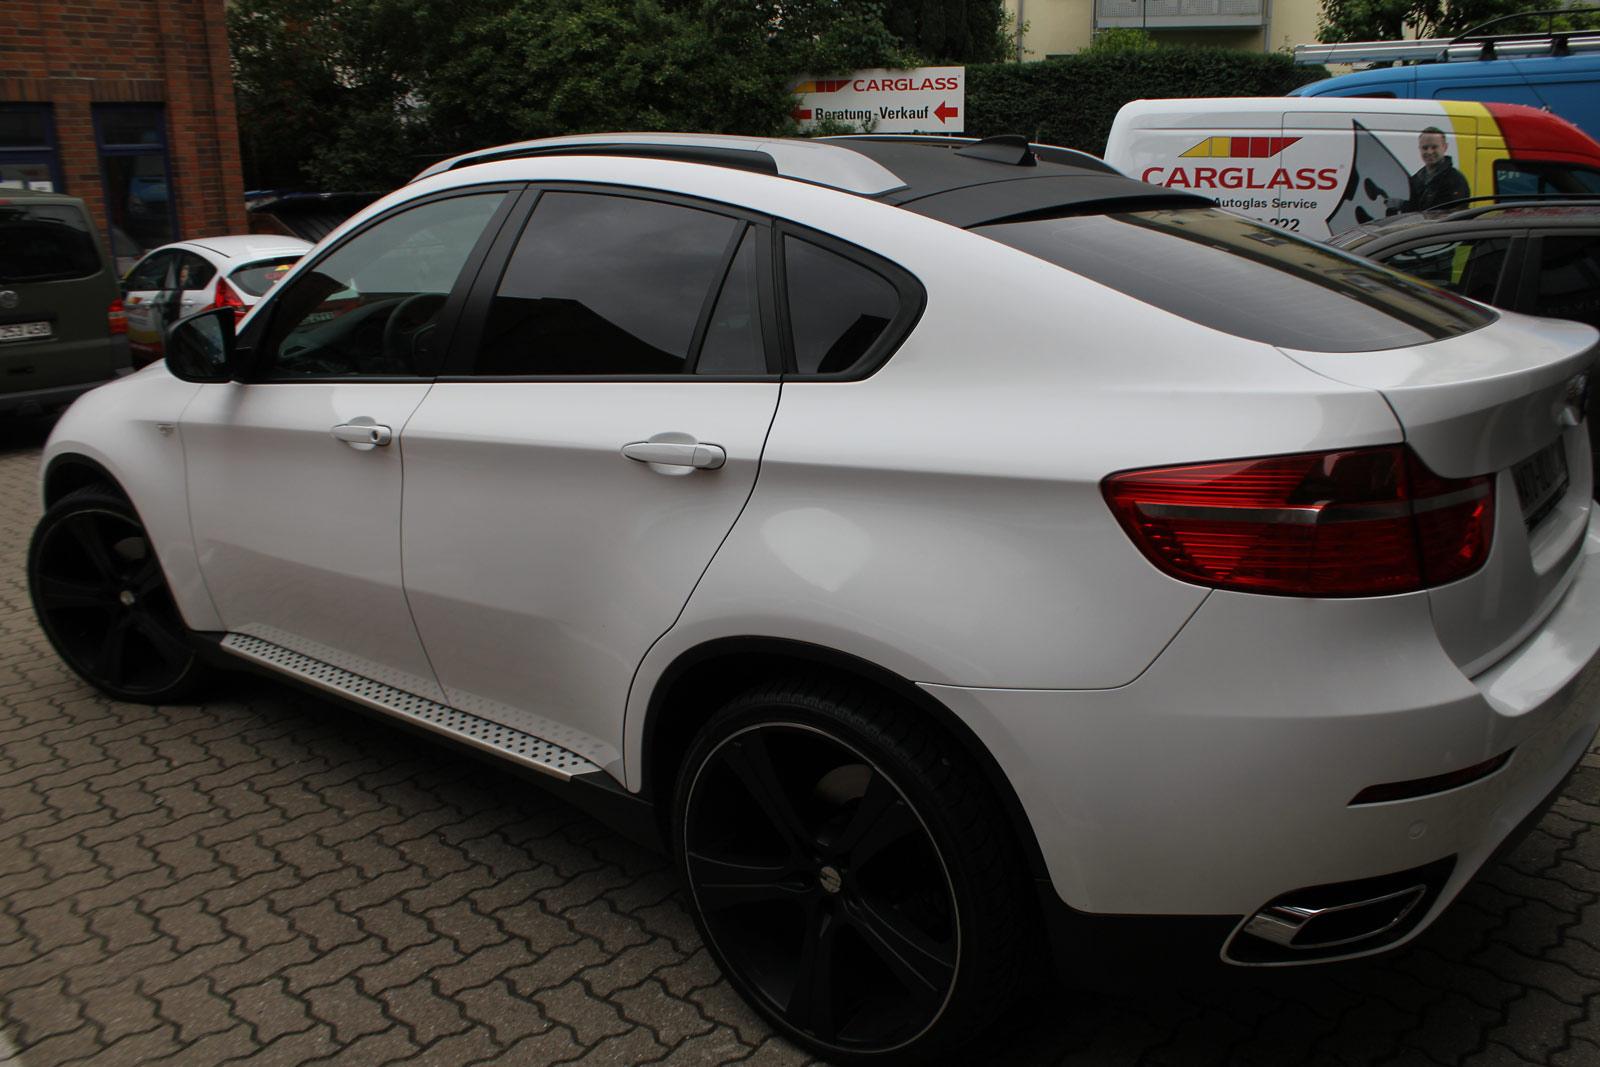 BMW_X6_FOLIERUNG_WEISS_GLANZ_PLUS_CARBON_06